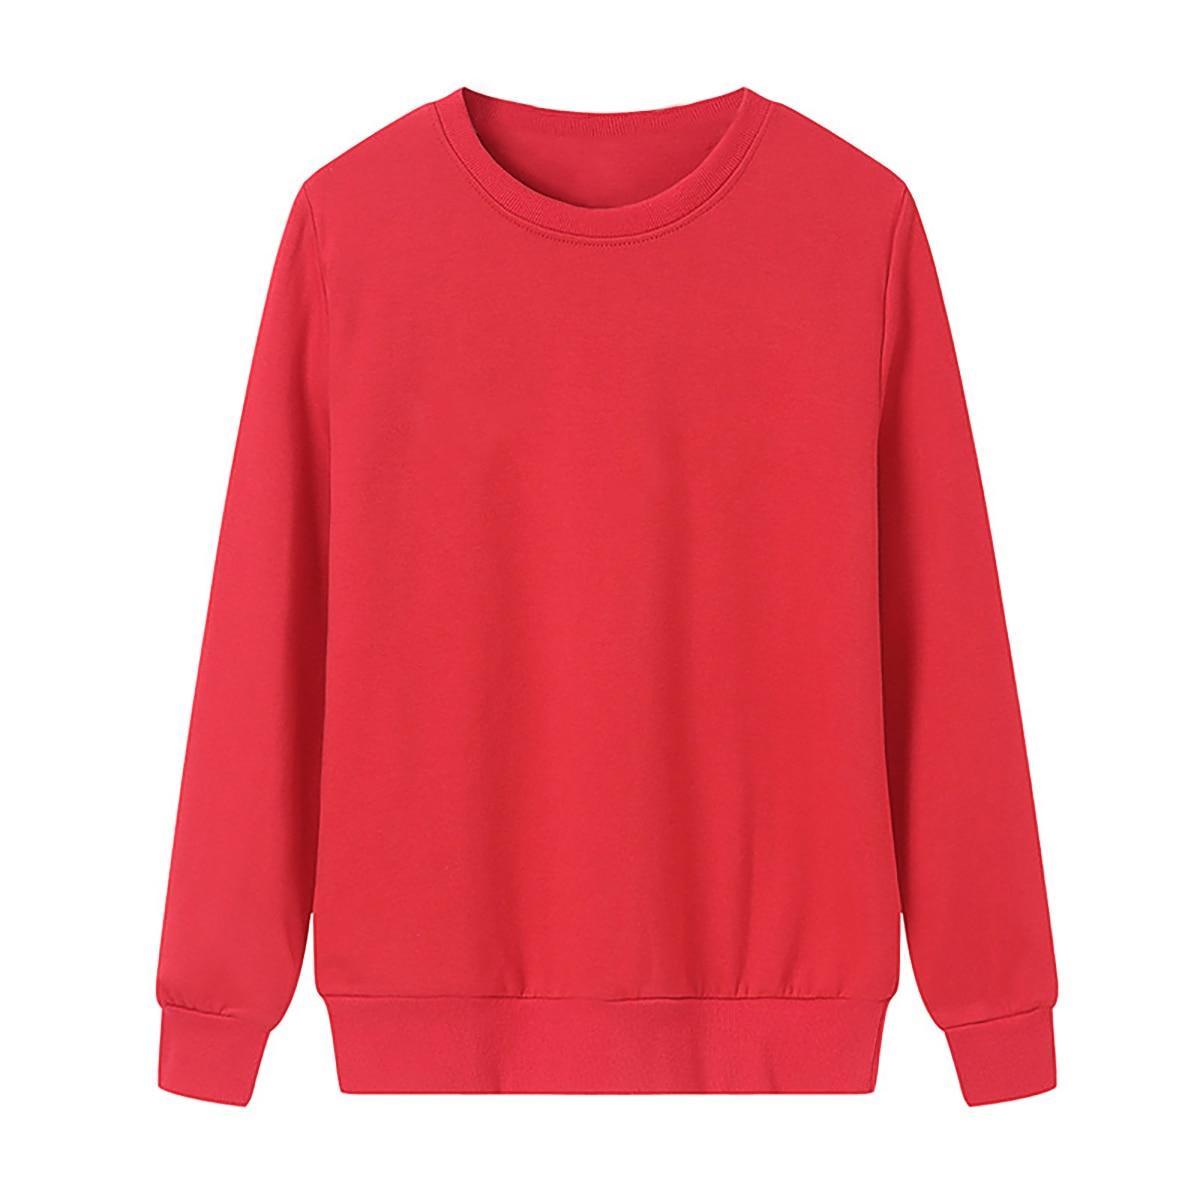 Solid Color Sweatshirt Women Casual Hoodie Fashion Winter Autumn Lasdies Pullover Fleece Black White Blue Red Gray Streetwear 10